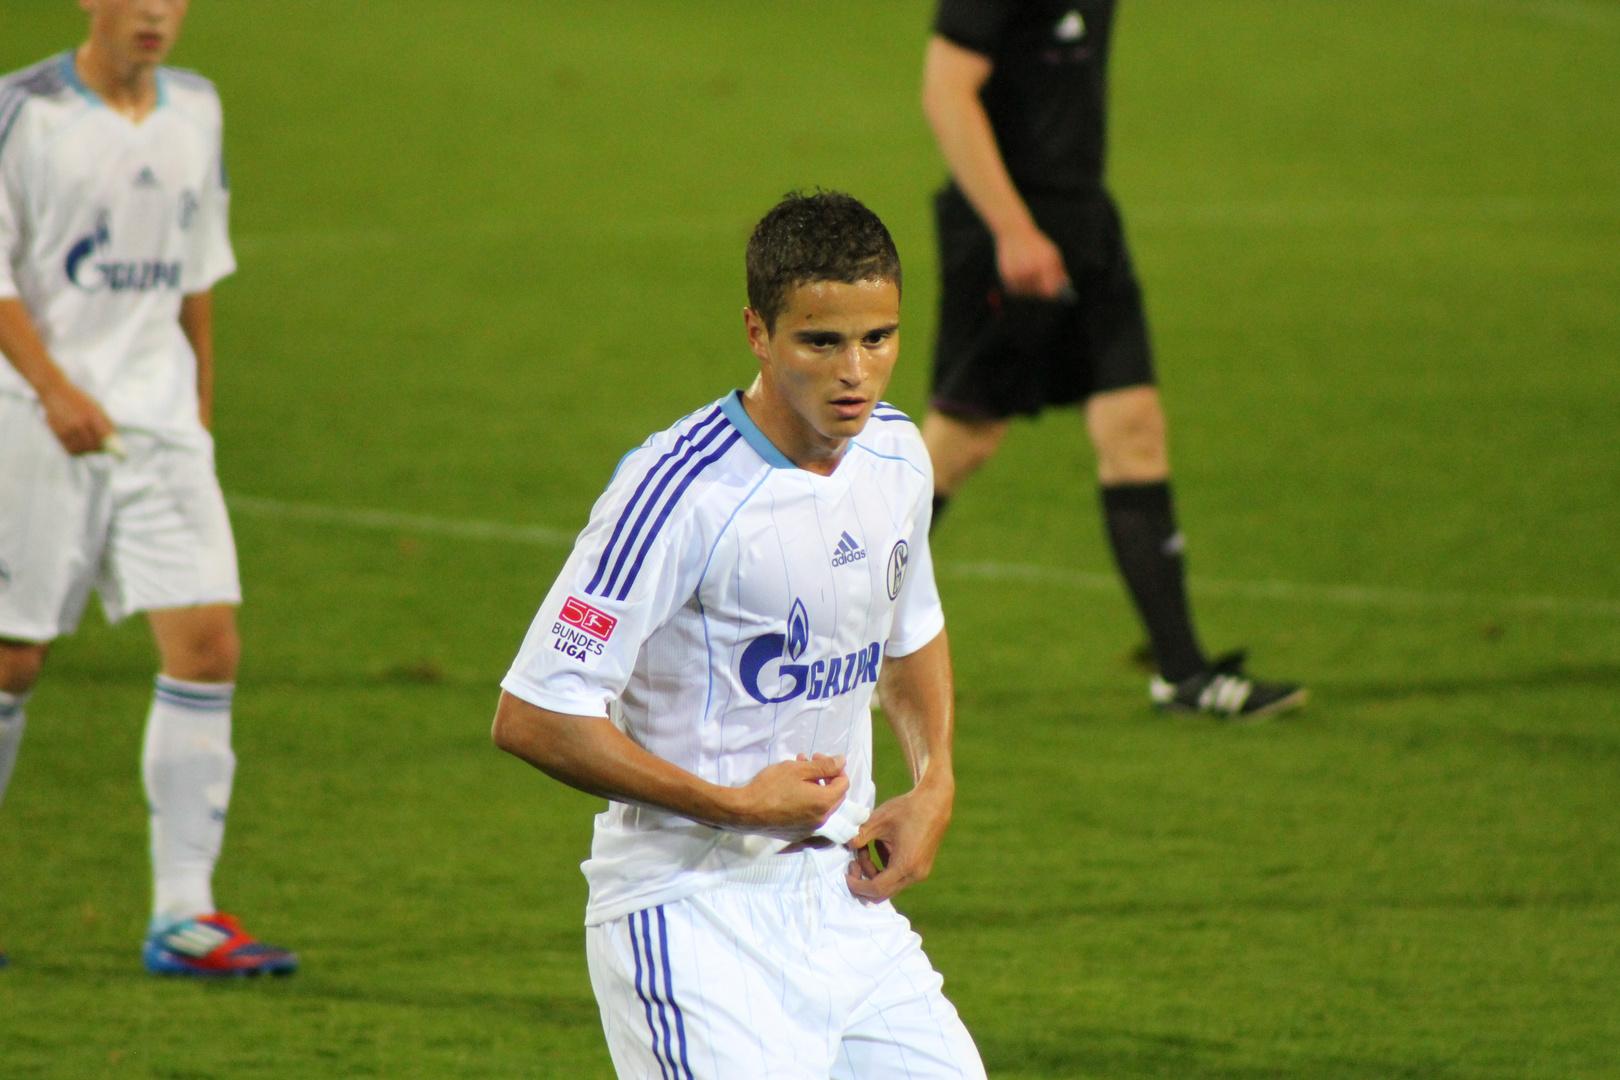 Schalke Neuzugang aus Barcelona - Ibrahim Affellay